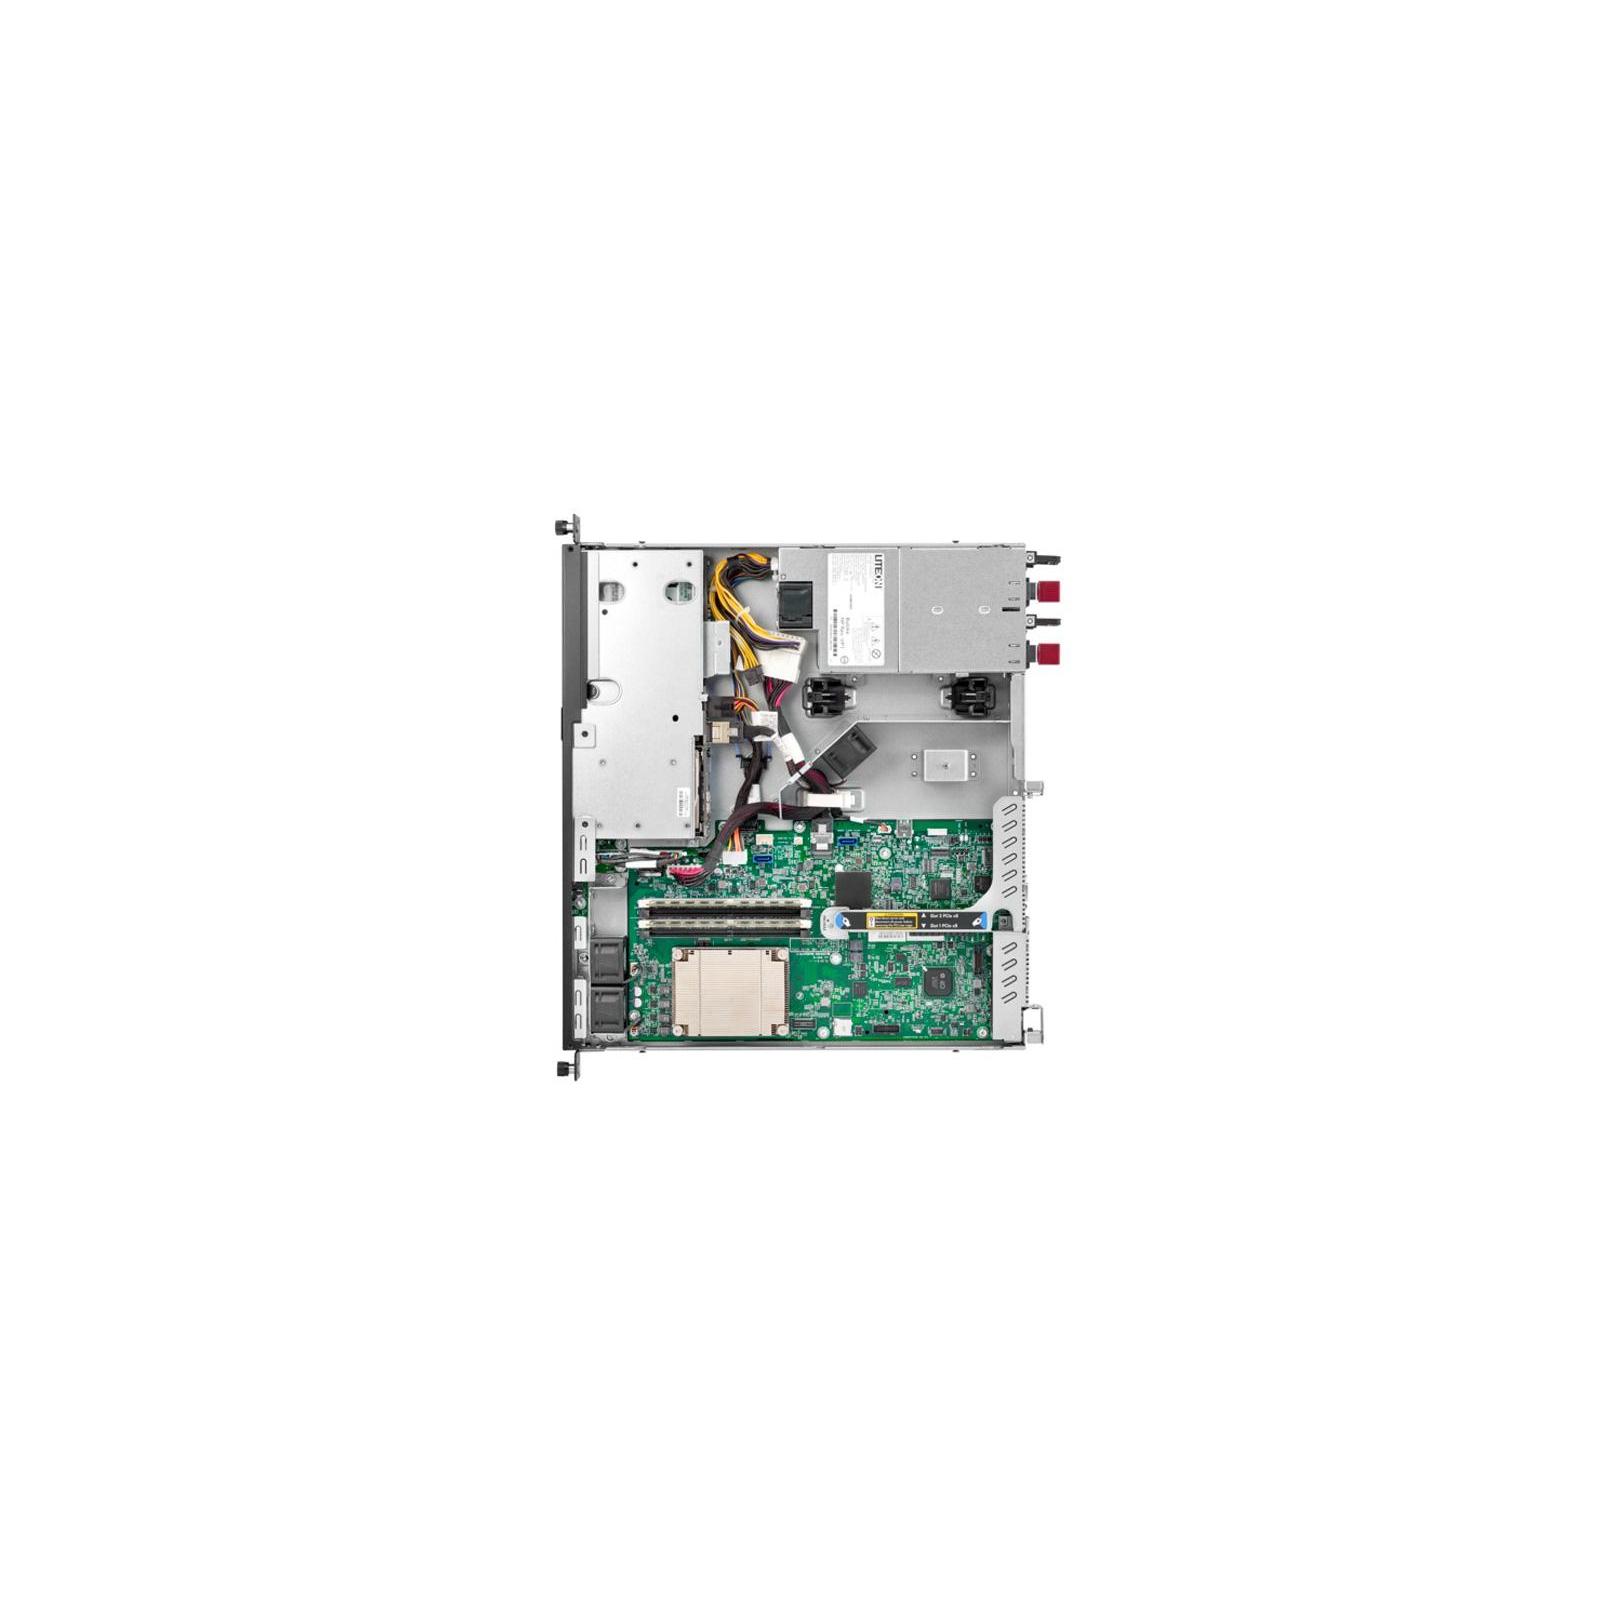 Сервер Hewlett Packard Enterprise 871428-B21 изображение 4